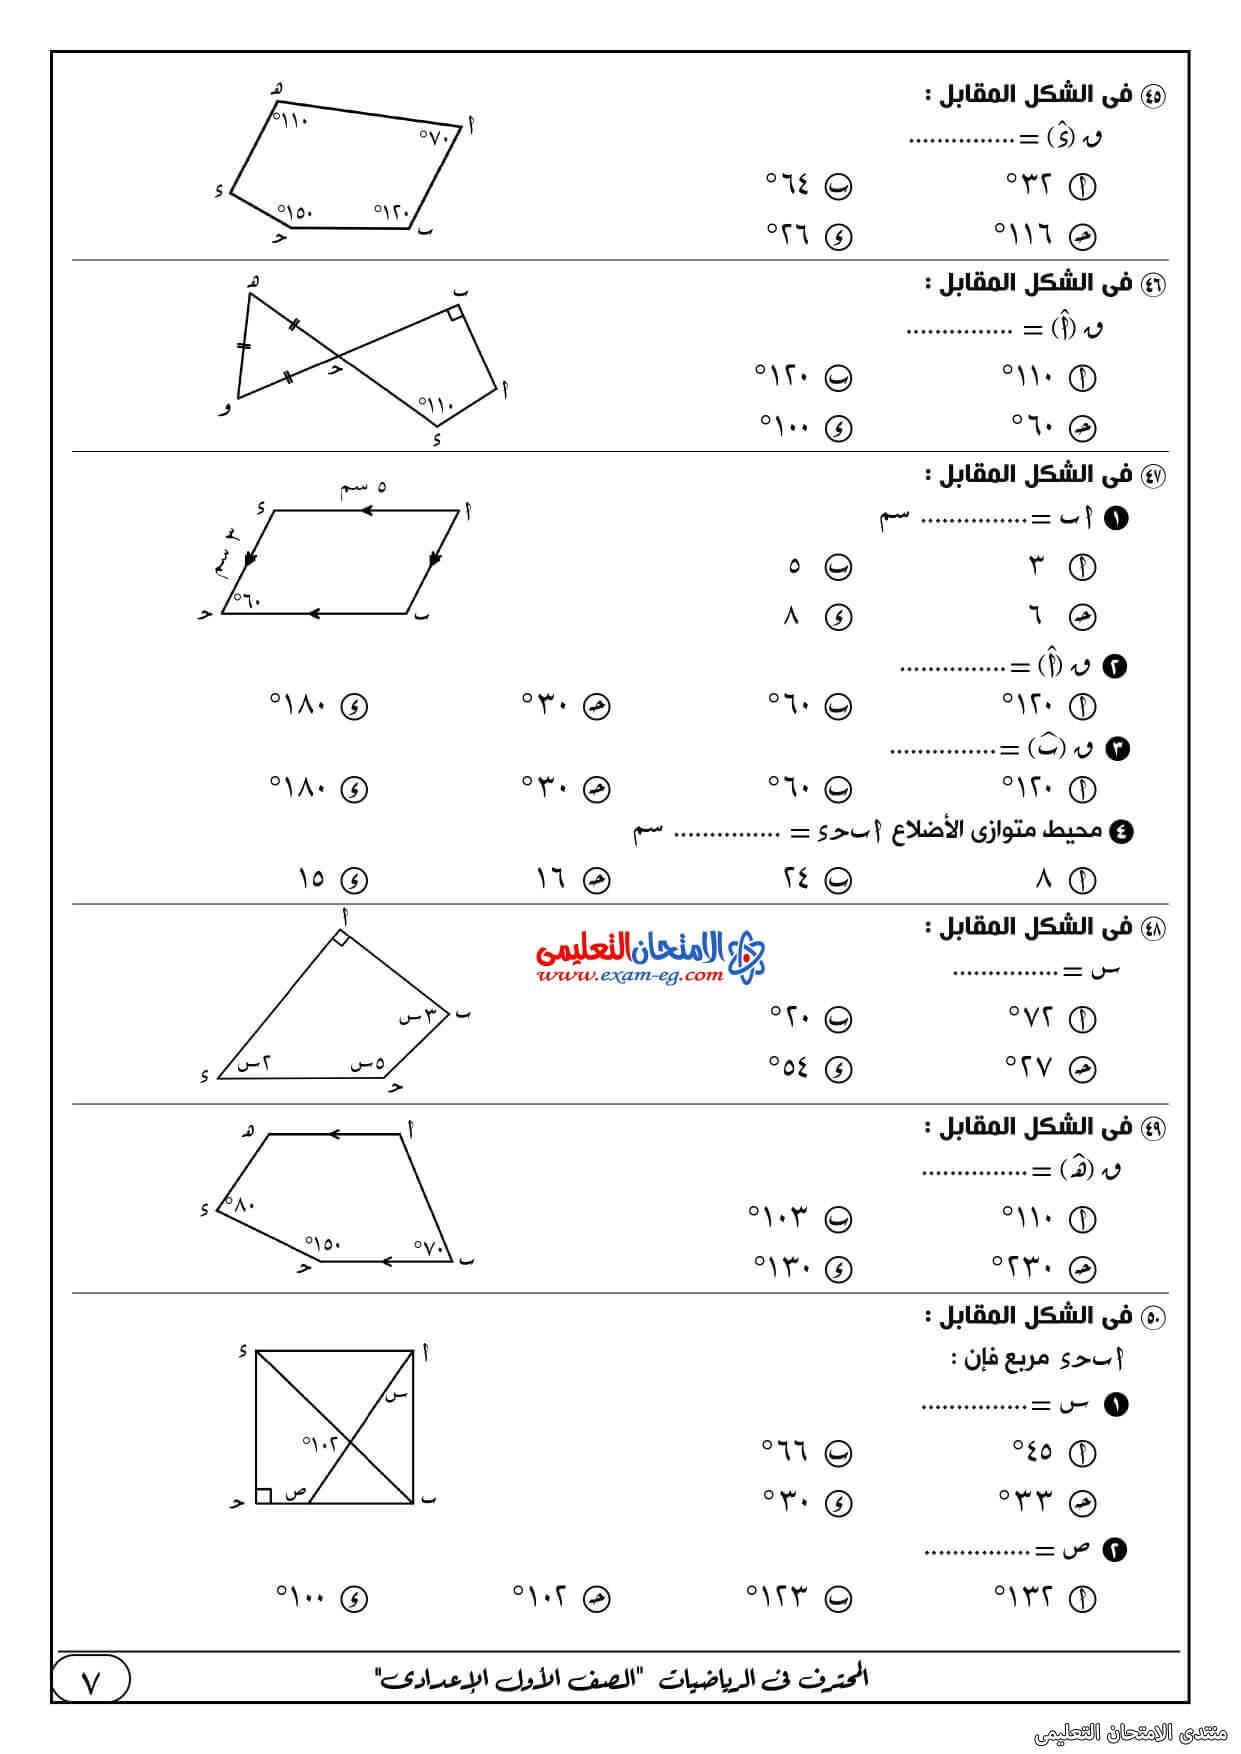 exam-eg.com_1616885550174.jpg